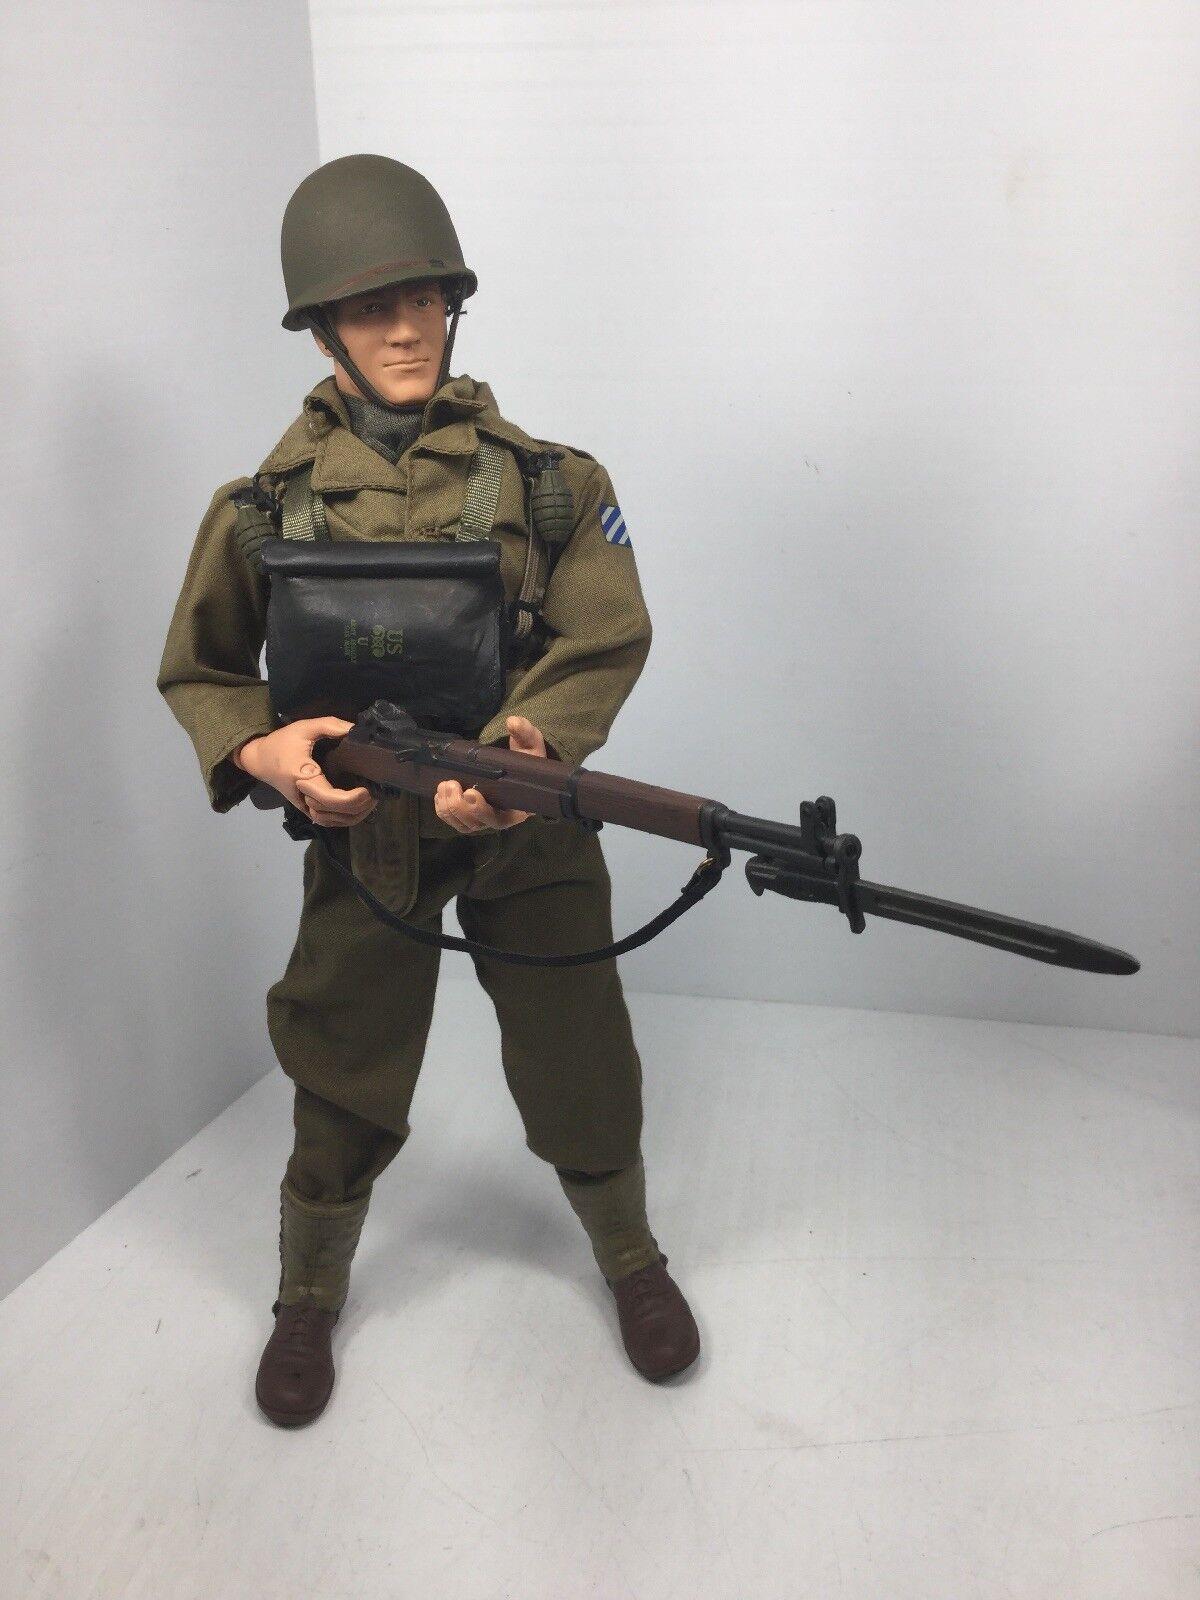 1 6 HASBRO 3RD Etats-Unis INF DIV FRANCE M1 Garand Full Gear Dragon DID BBI WW2 21ST